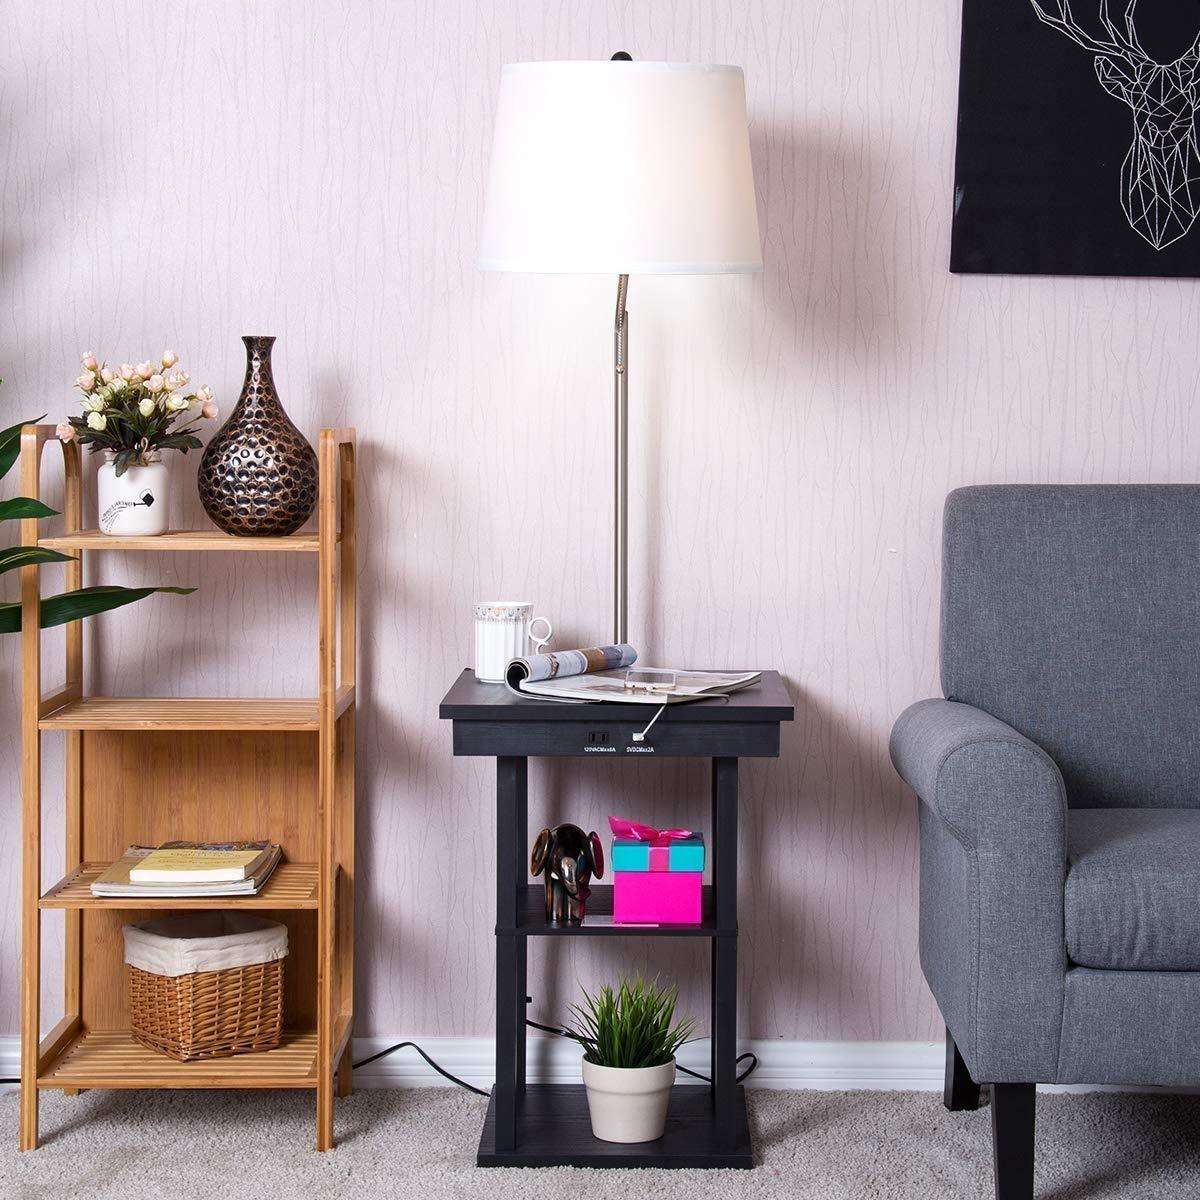 Table Swing Arm Floor Lamp with Shade 2 USB Ports - - Amazon.com